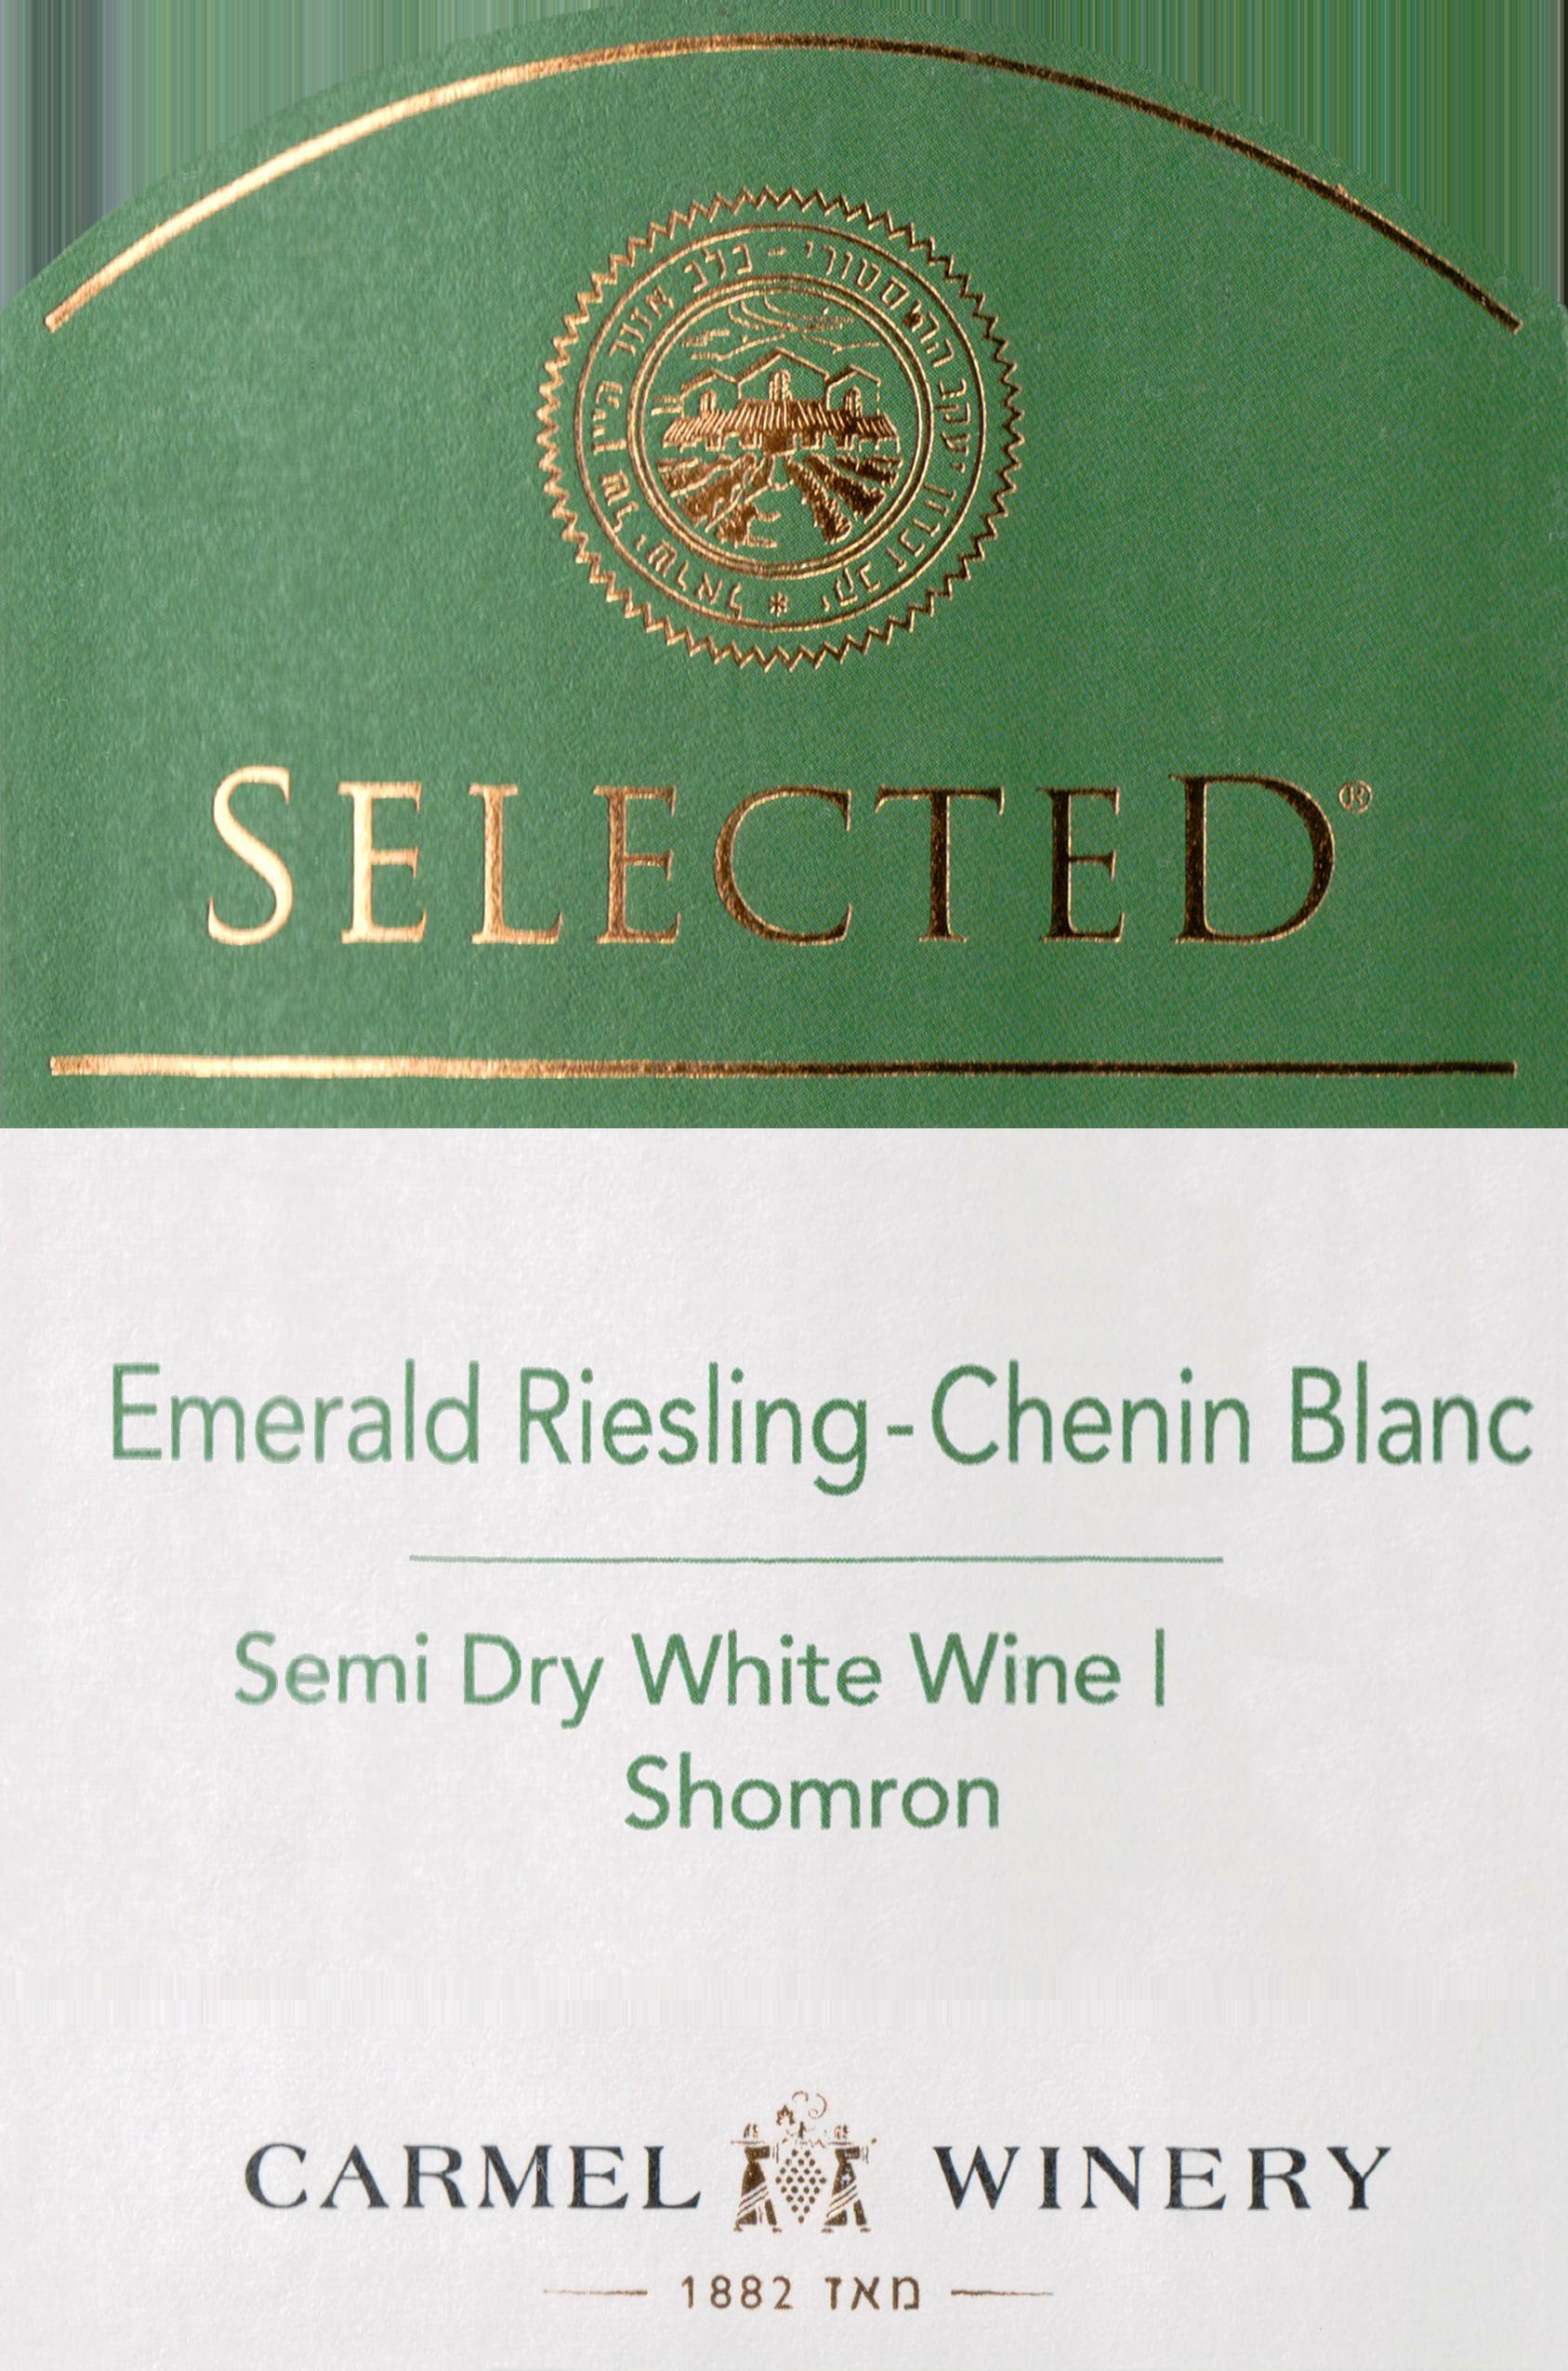 Carmel Selected Emerald Riesling Chenin Blanc